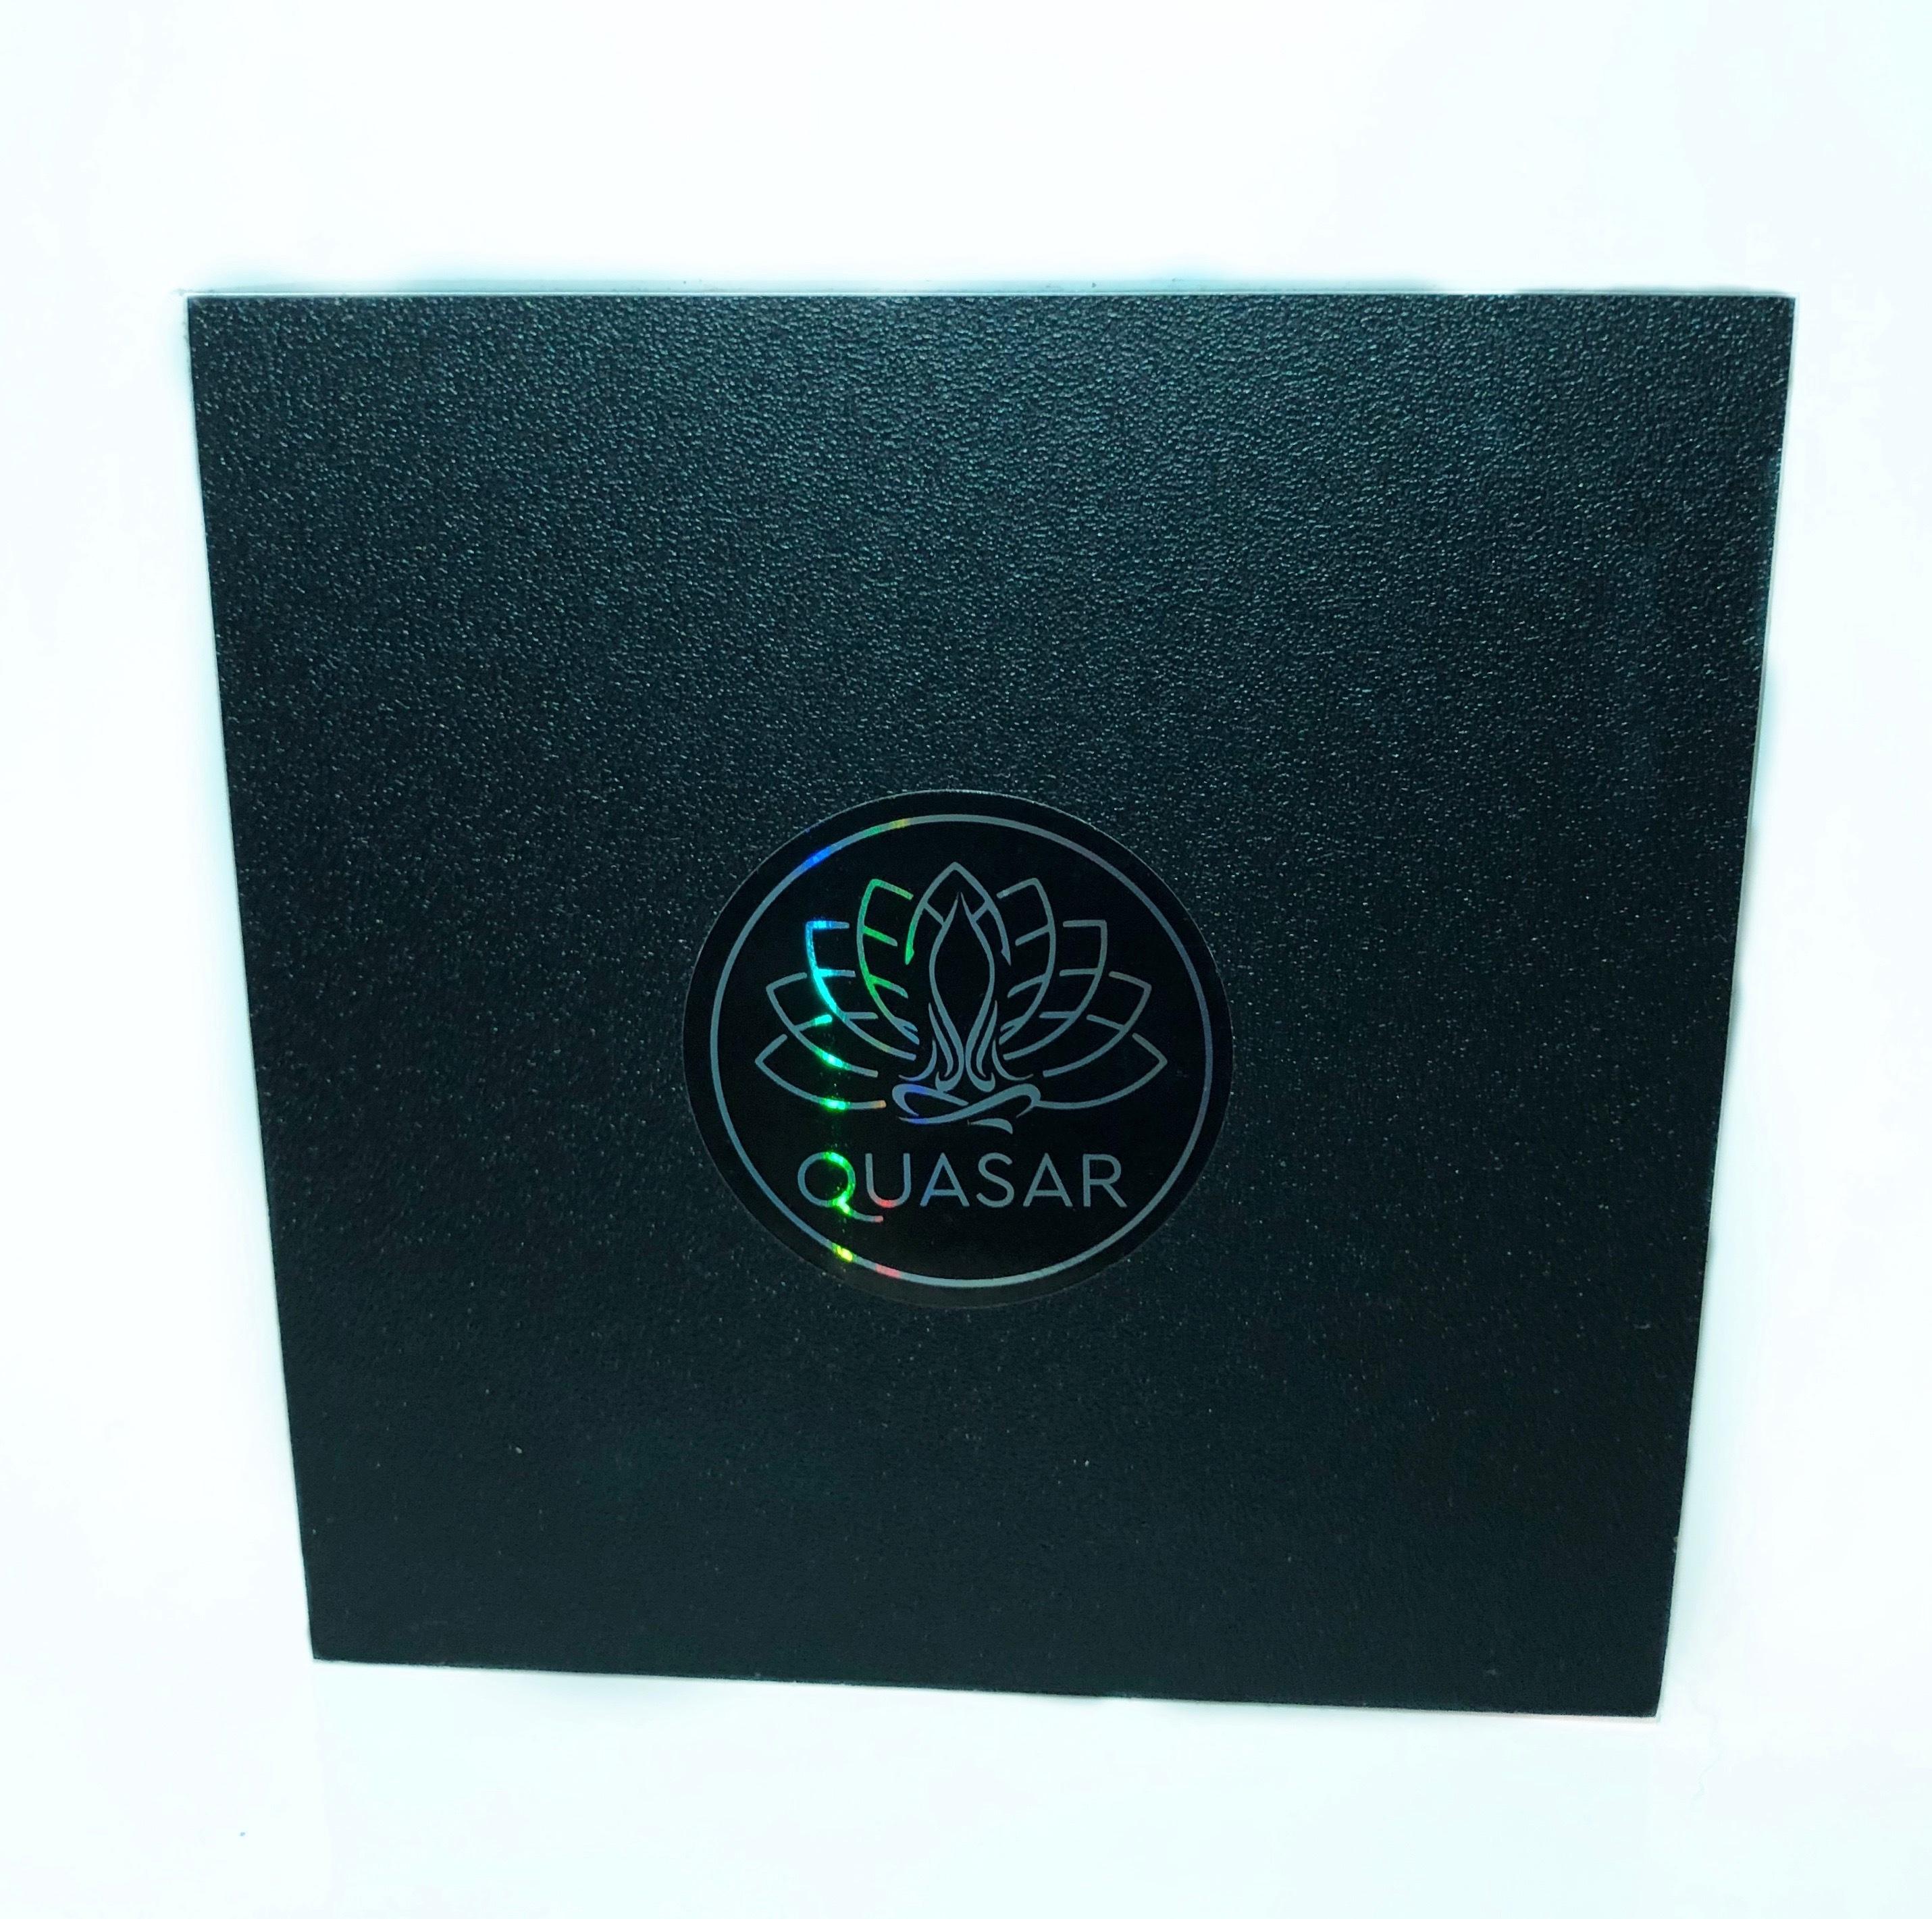 Quasar Shielding Box (For the Home)- Radiation Neutralizer